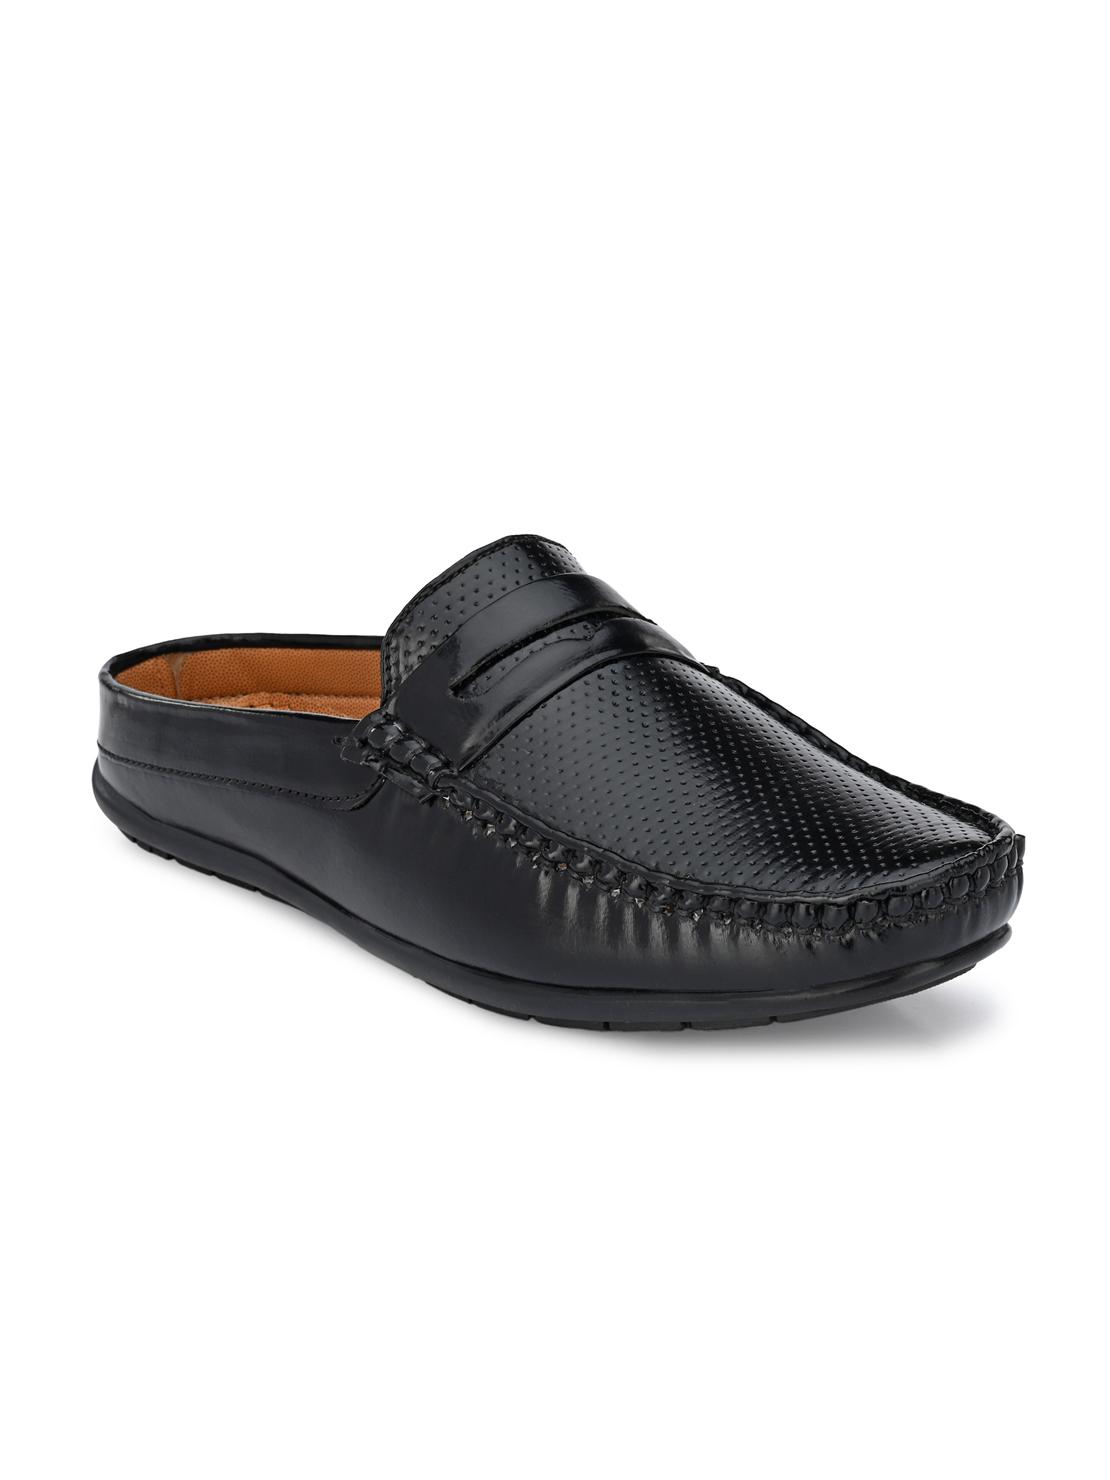 Guava   Guava Men Casual Open Back Loafers Mules Shoe - Black